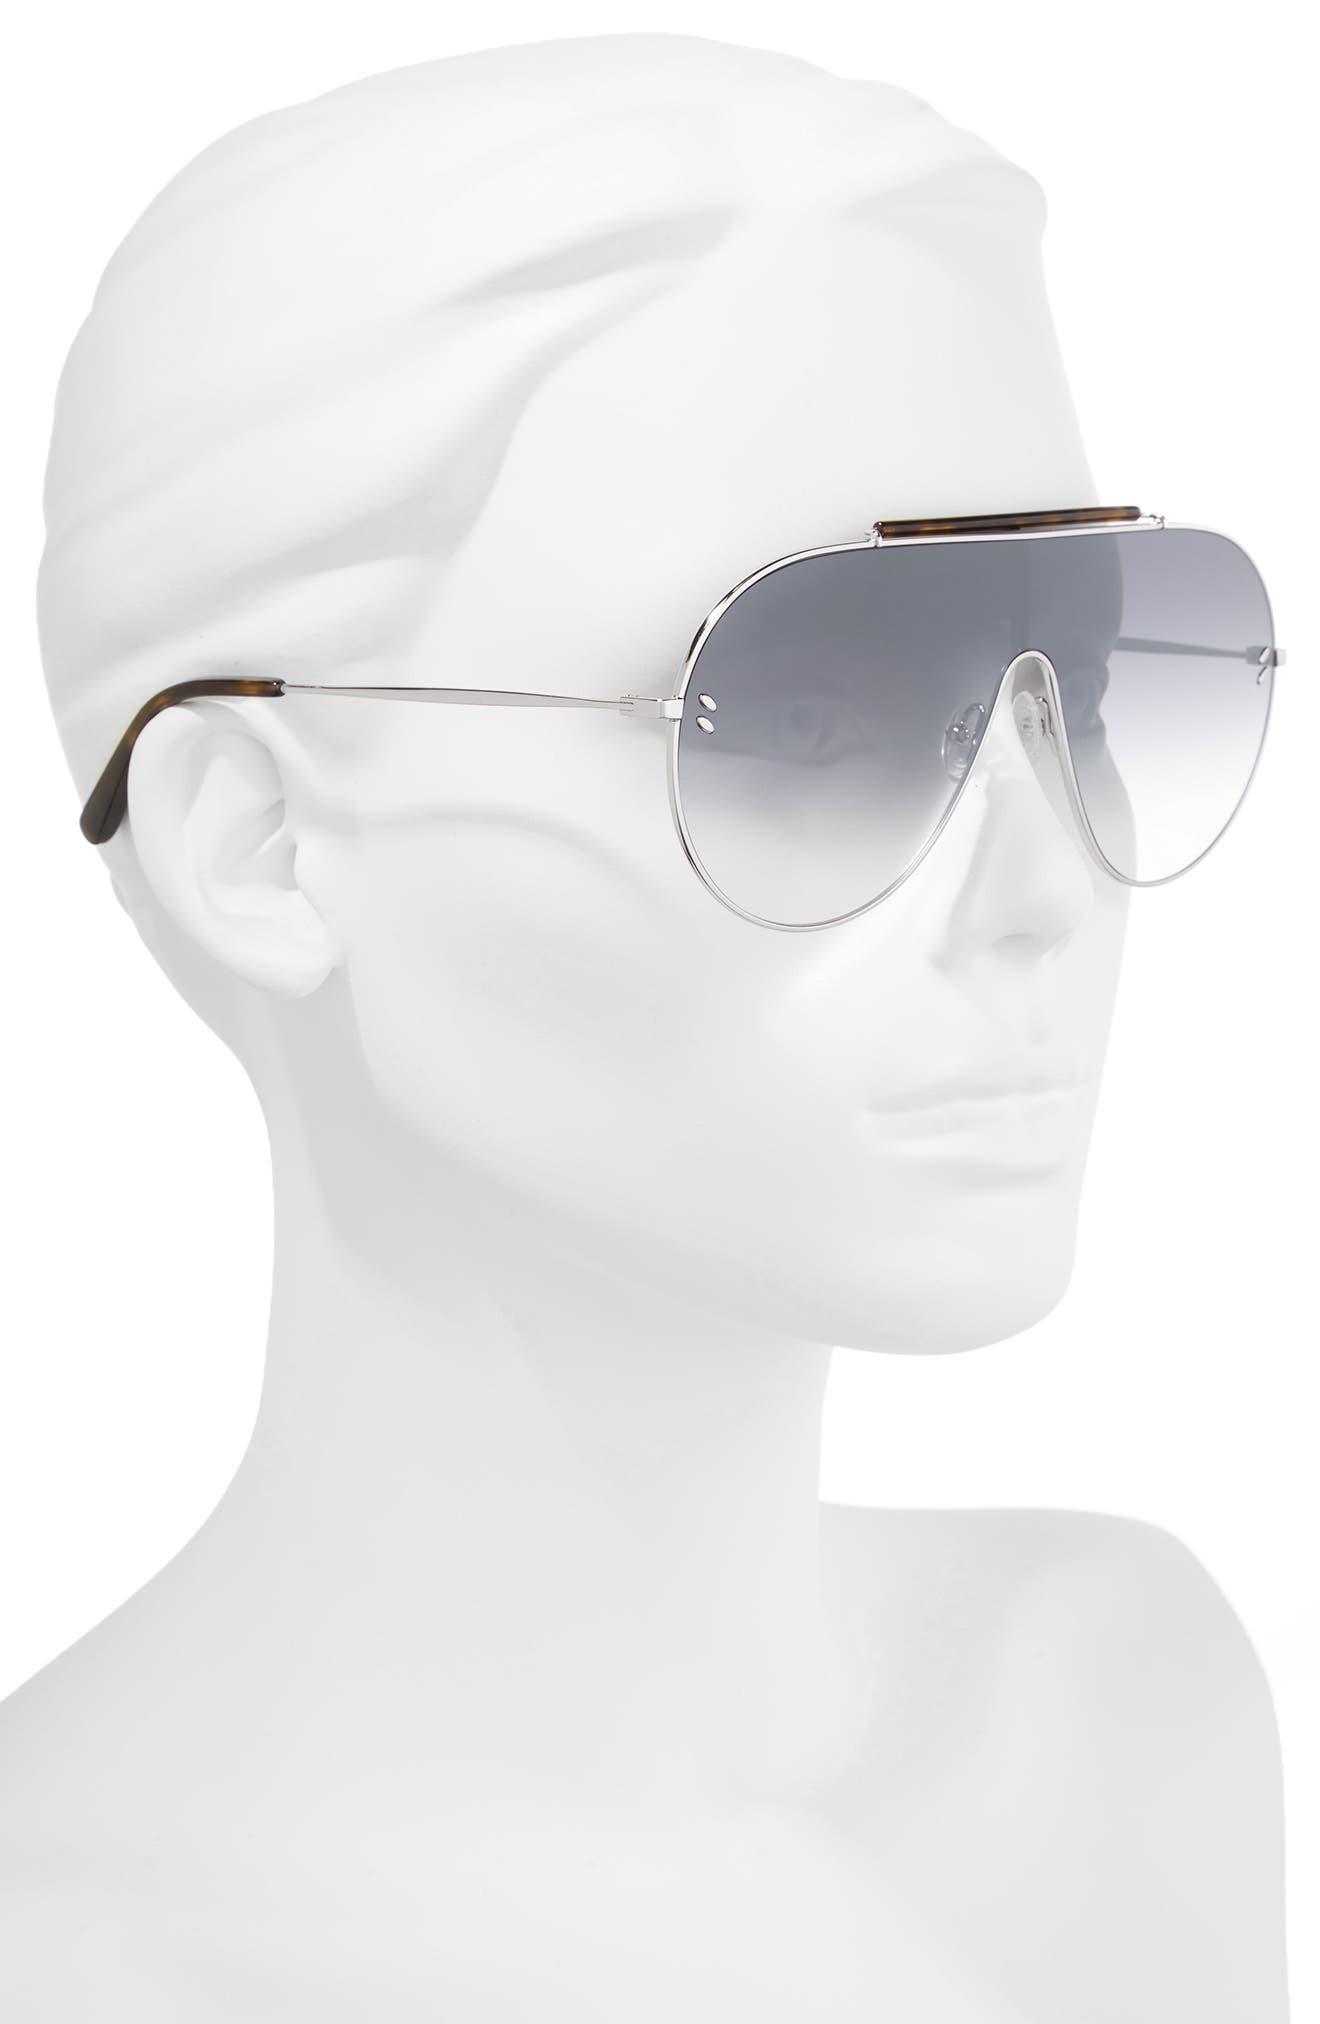 65mm Shield Sunglasses,                             Alternate thumbnail 3, color,